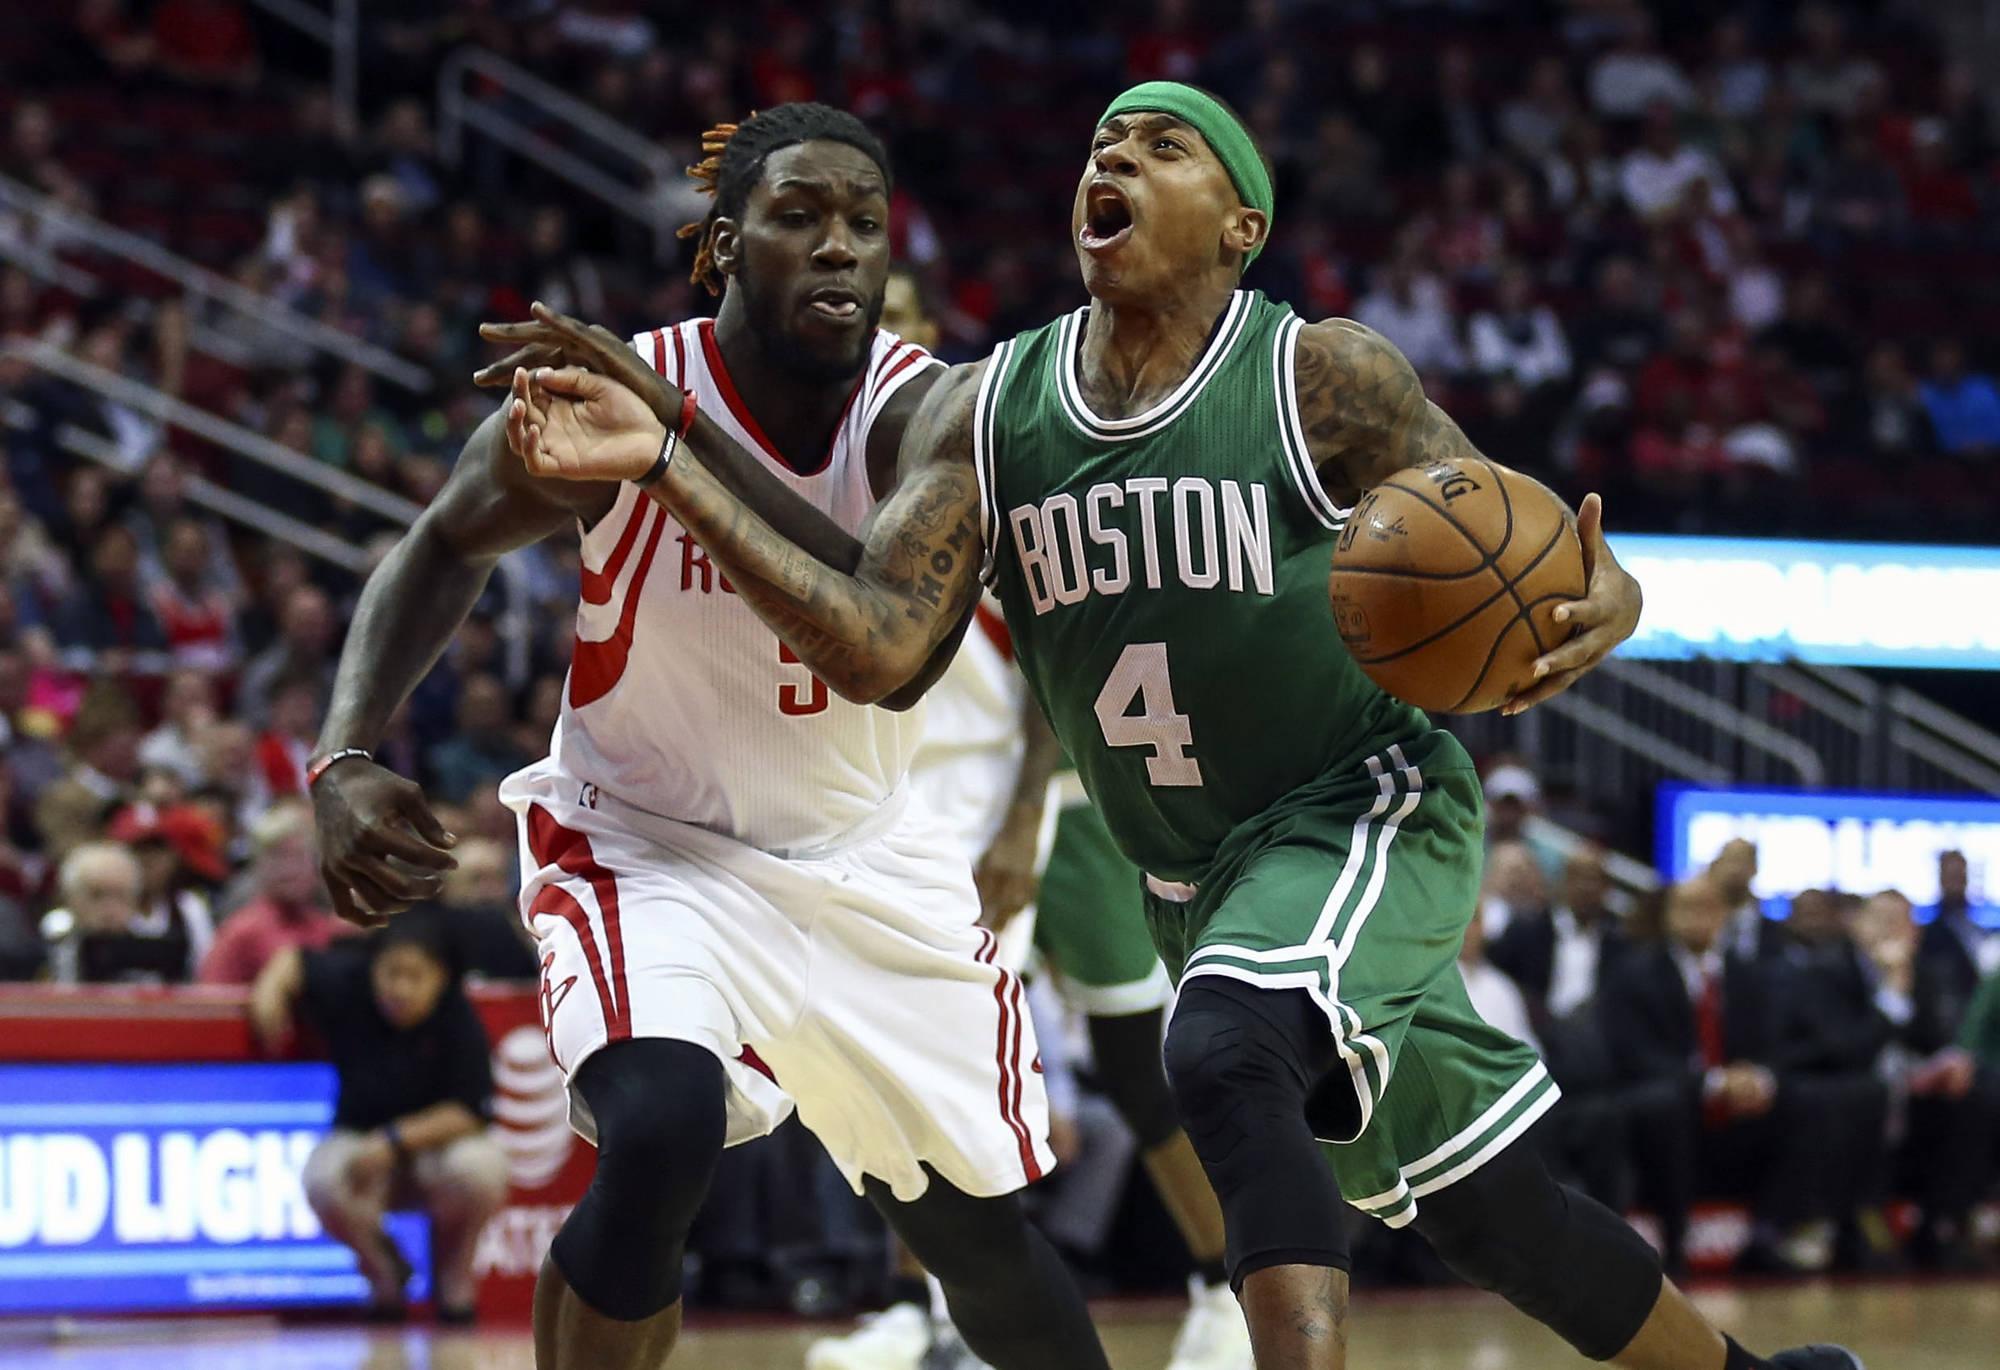 Isaiah Thomas Plays NBA 2K on Jumbotron